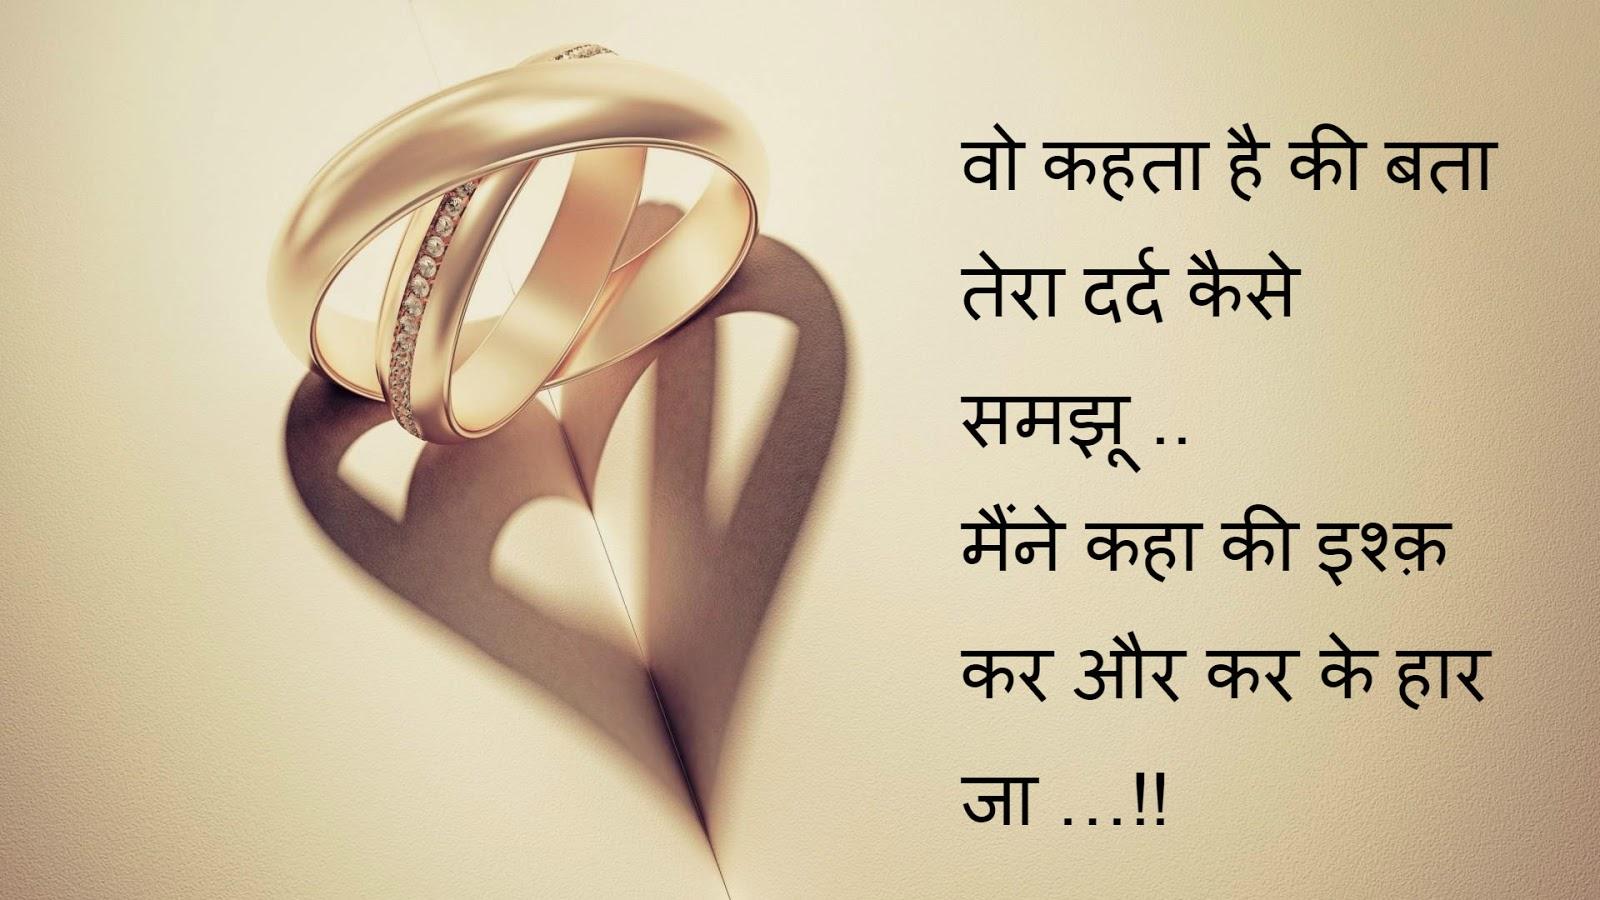 Hindi with images latest love shayari in hindi 2017 latest sms latest love shayari in hindi 2018 ccuart Image collections